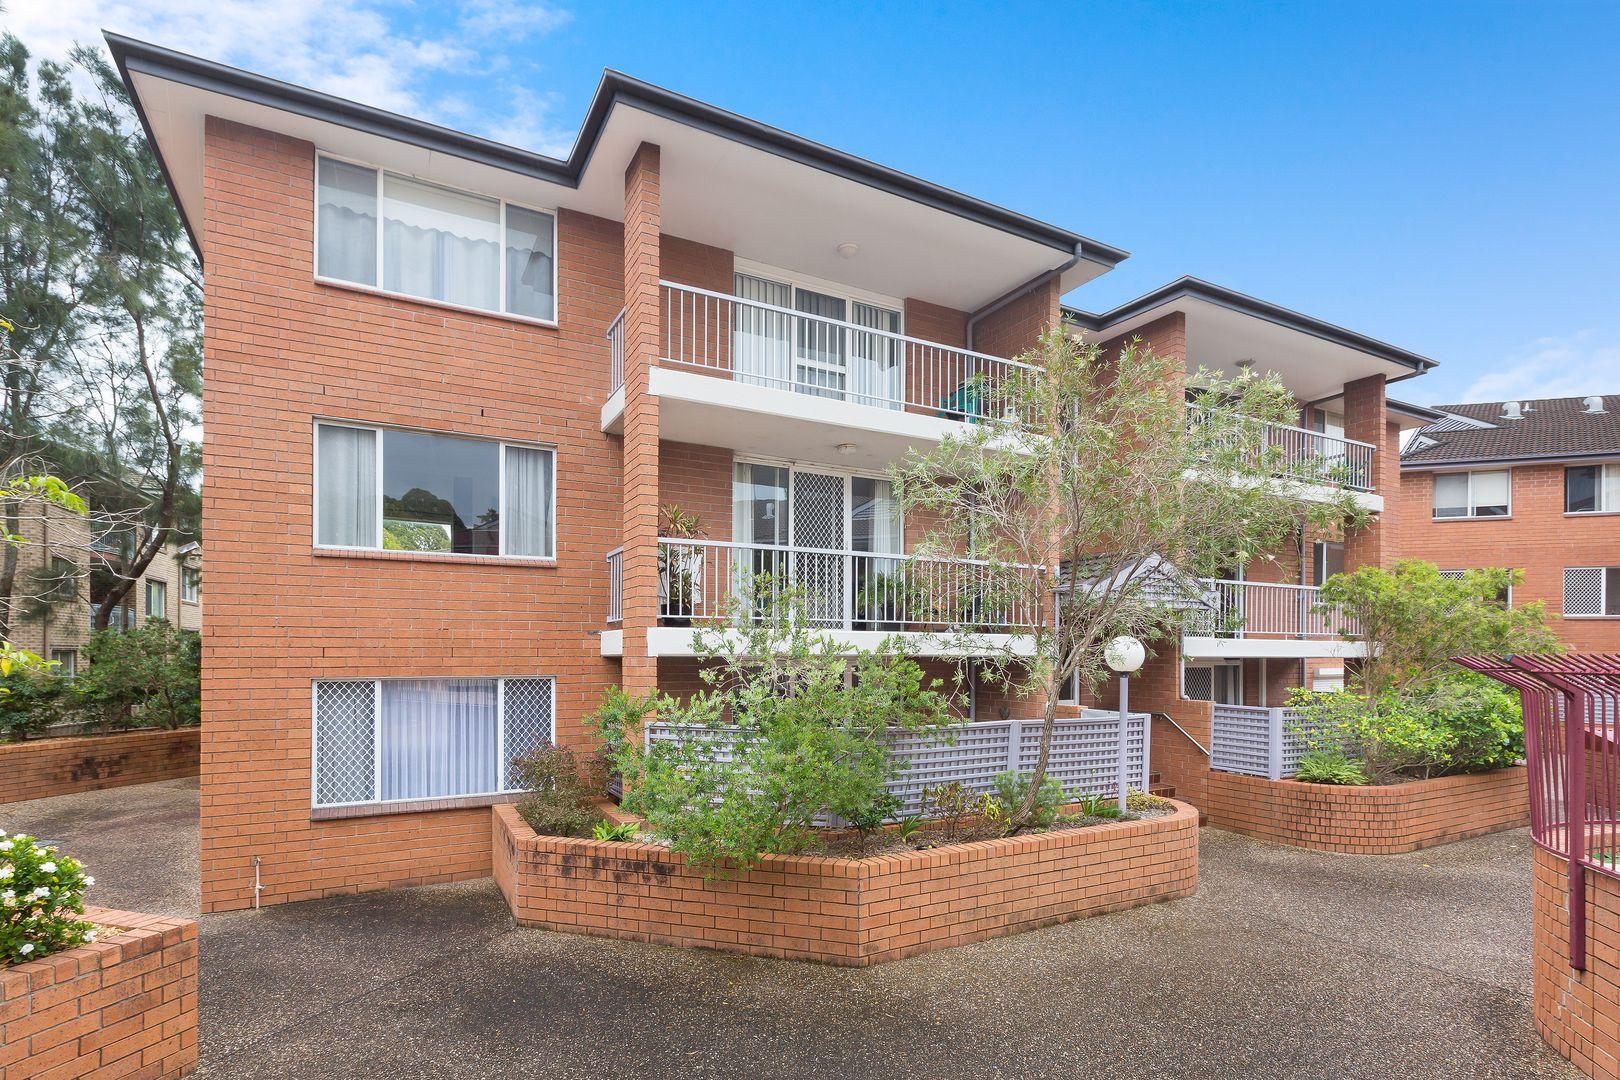 25/491 President Avenue, Sutherland NSW 2232, Image 0